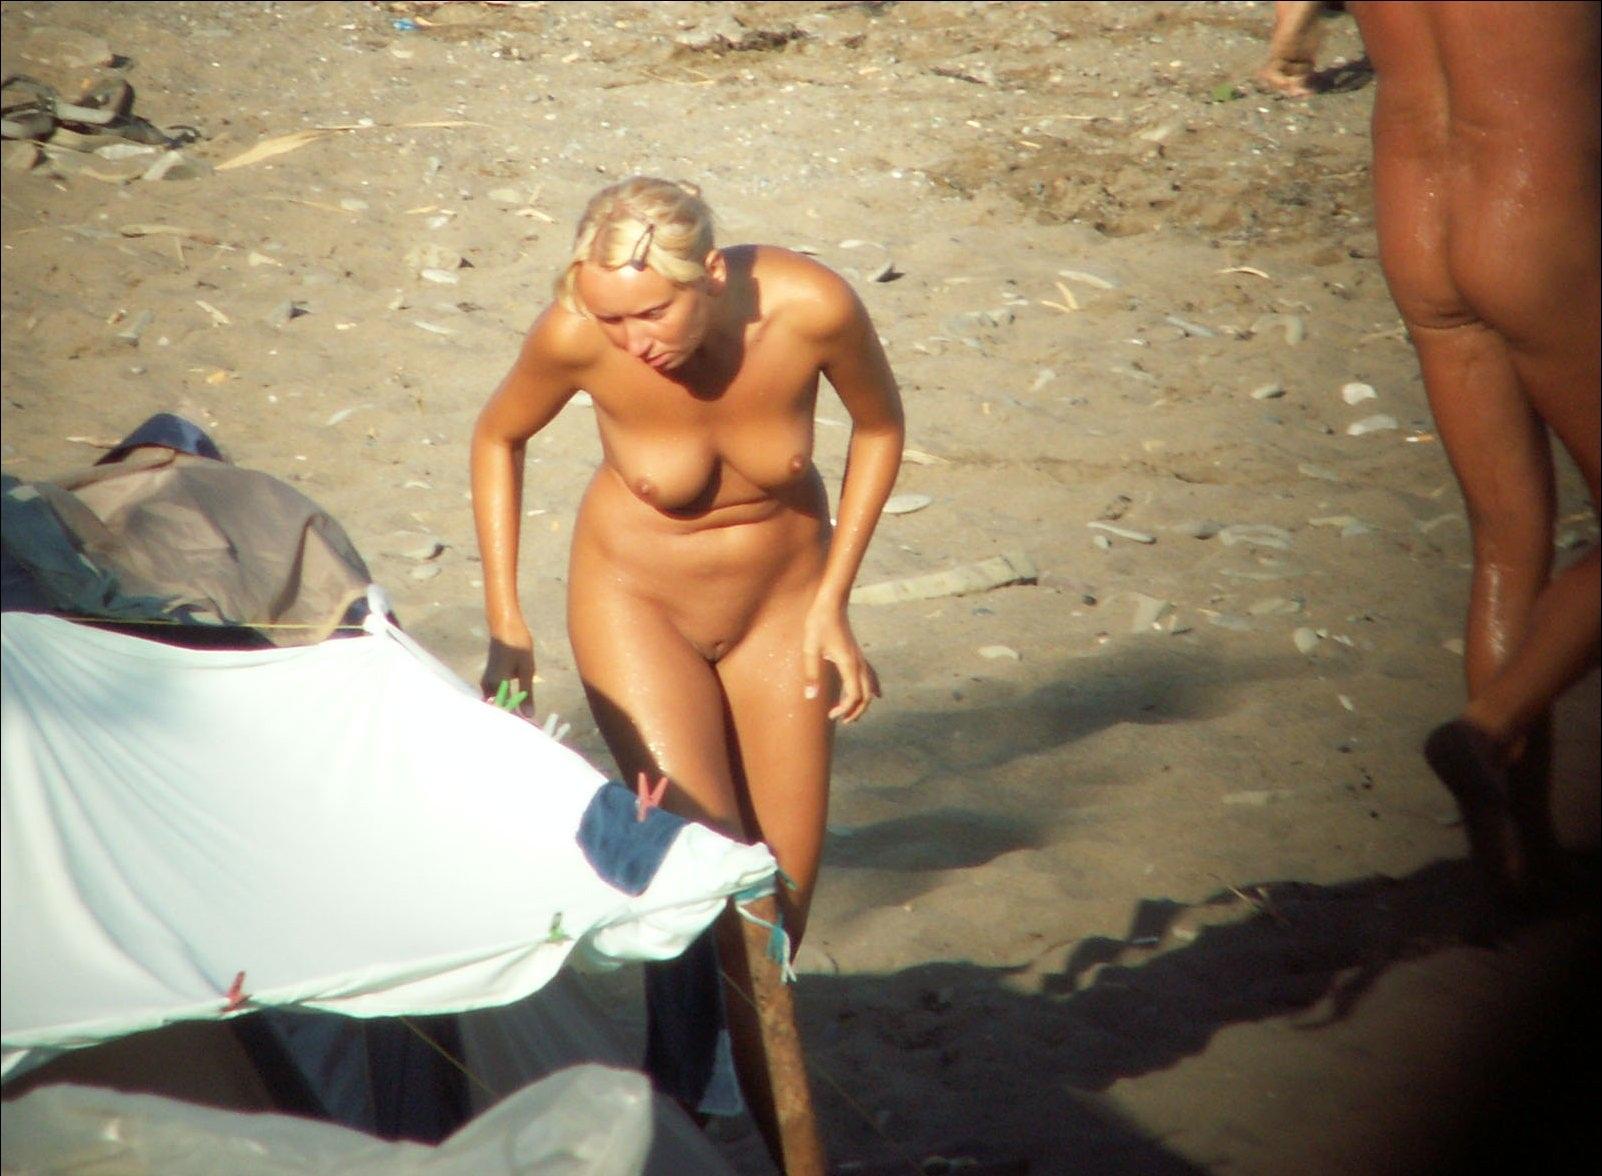 Nude girl exposed by voyeurs walking on the beach